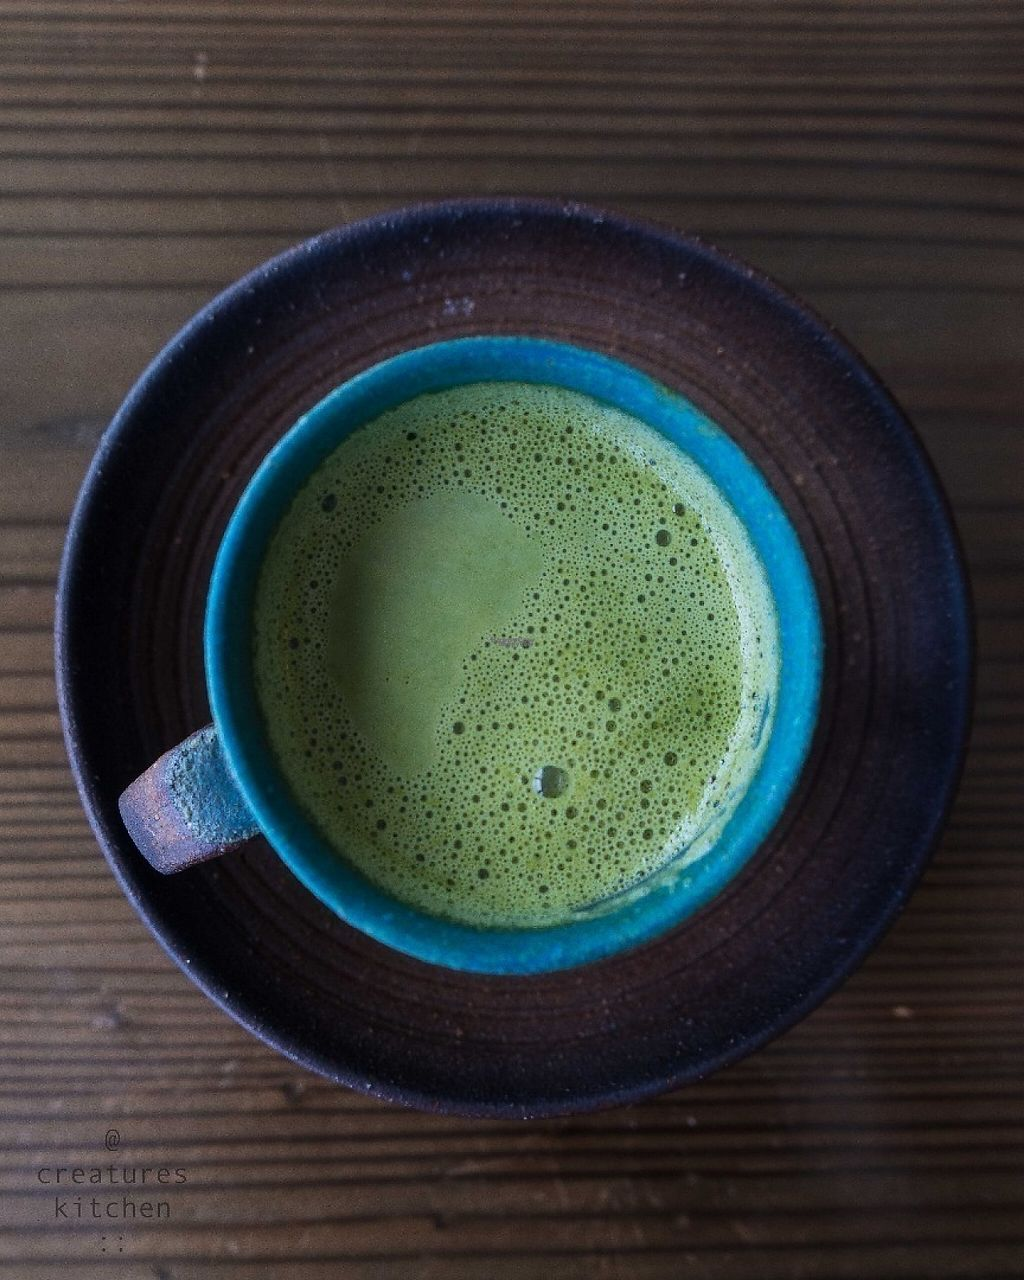 "Photo of Imacoco  by <a href=""/members/profile/EmmaCebuliak"">EmmaCebuliak</a> <br/>Soy matcha latte <br/> January 18, 2017  - <a href='/contact/abuse/image/85000/213032'>Report</a>"